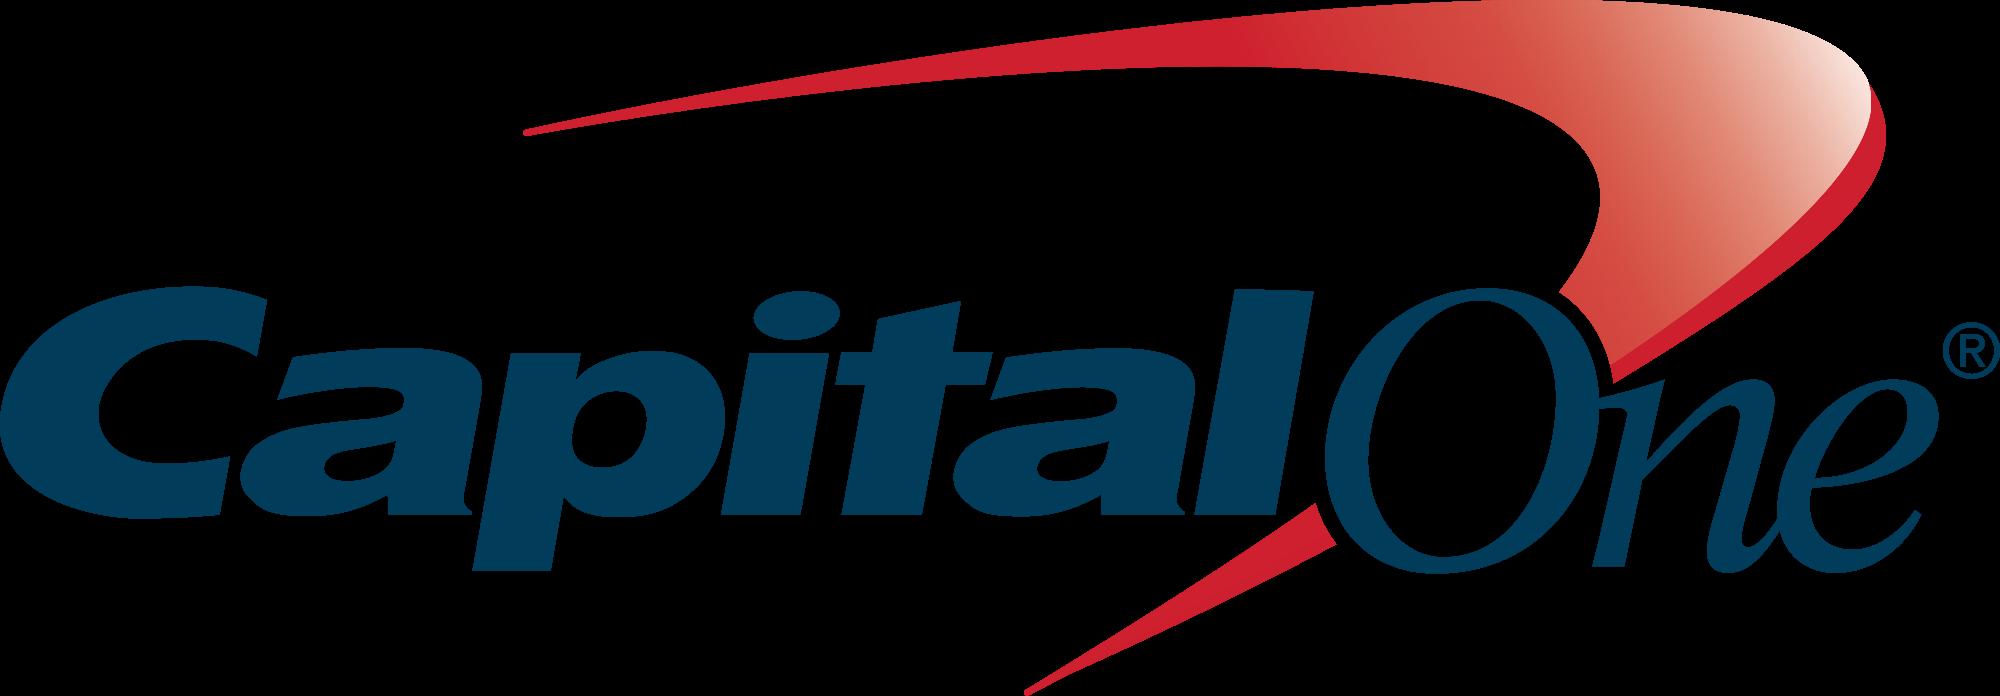 CapitalOne logo Web-C1_Core_G_302_PMSC.png